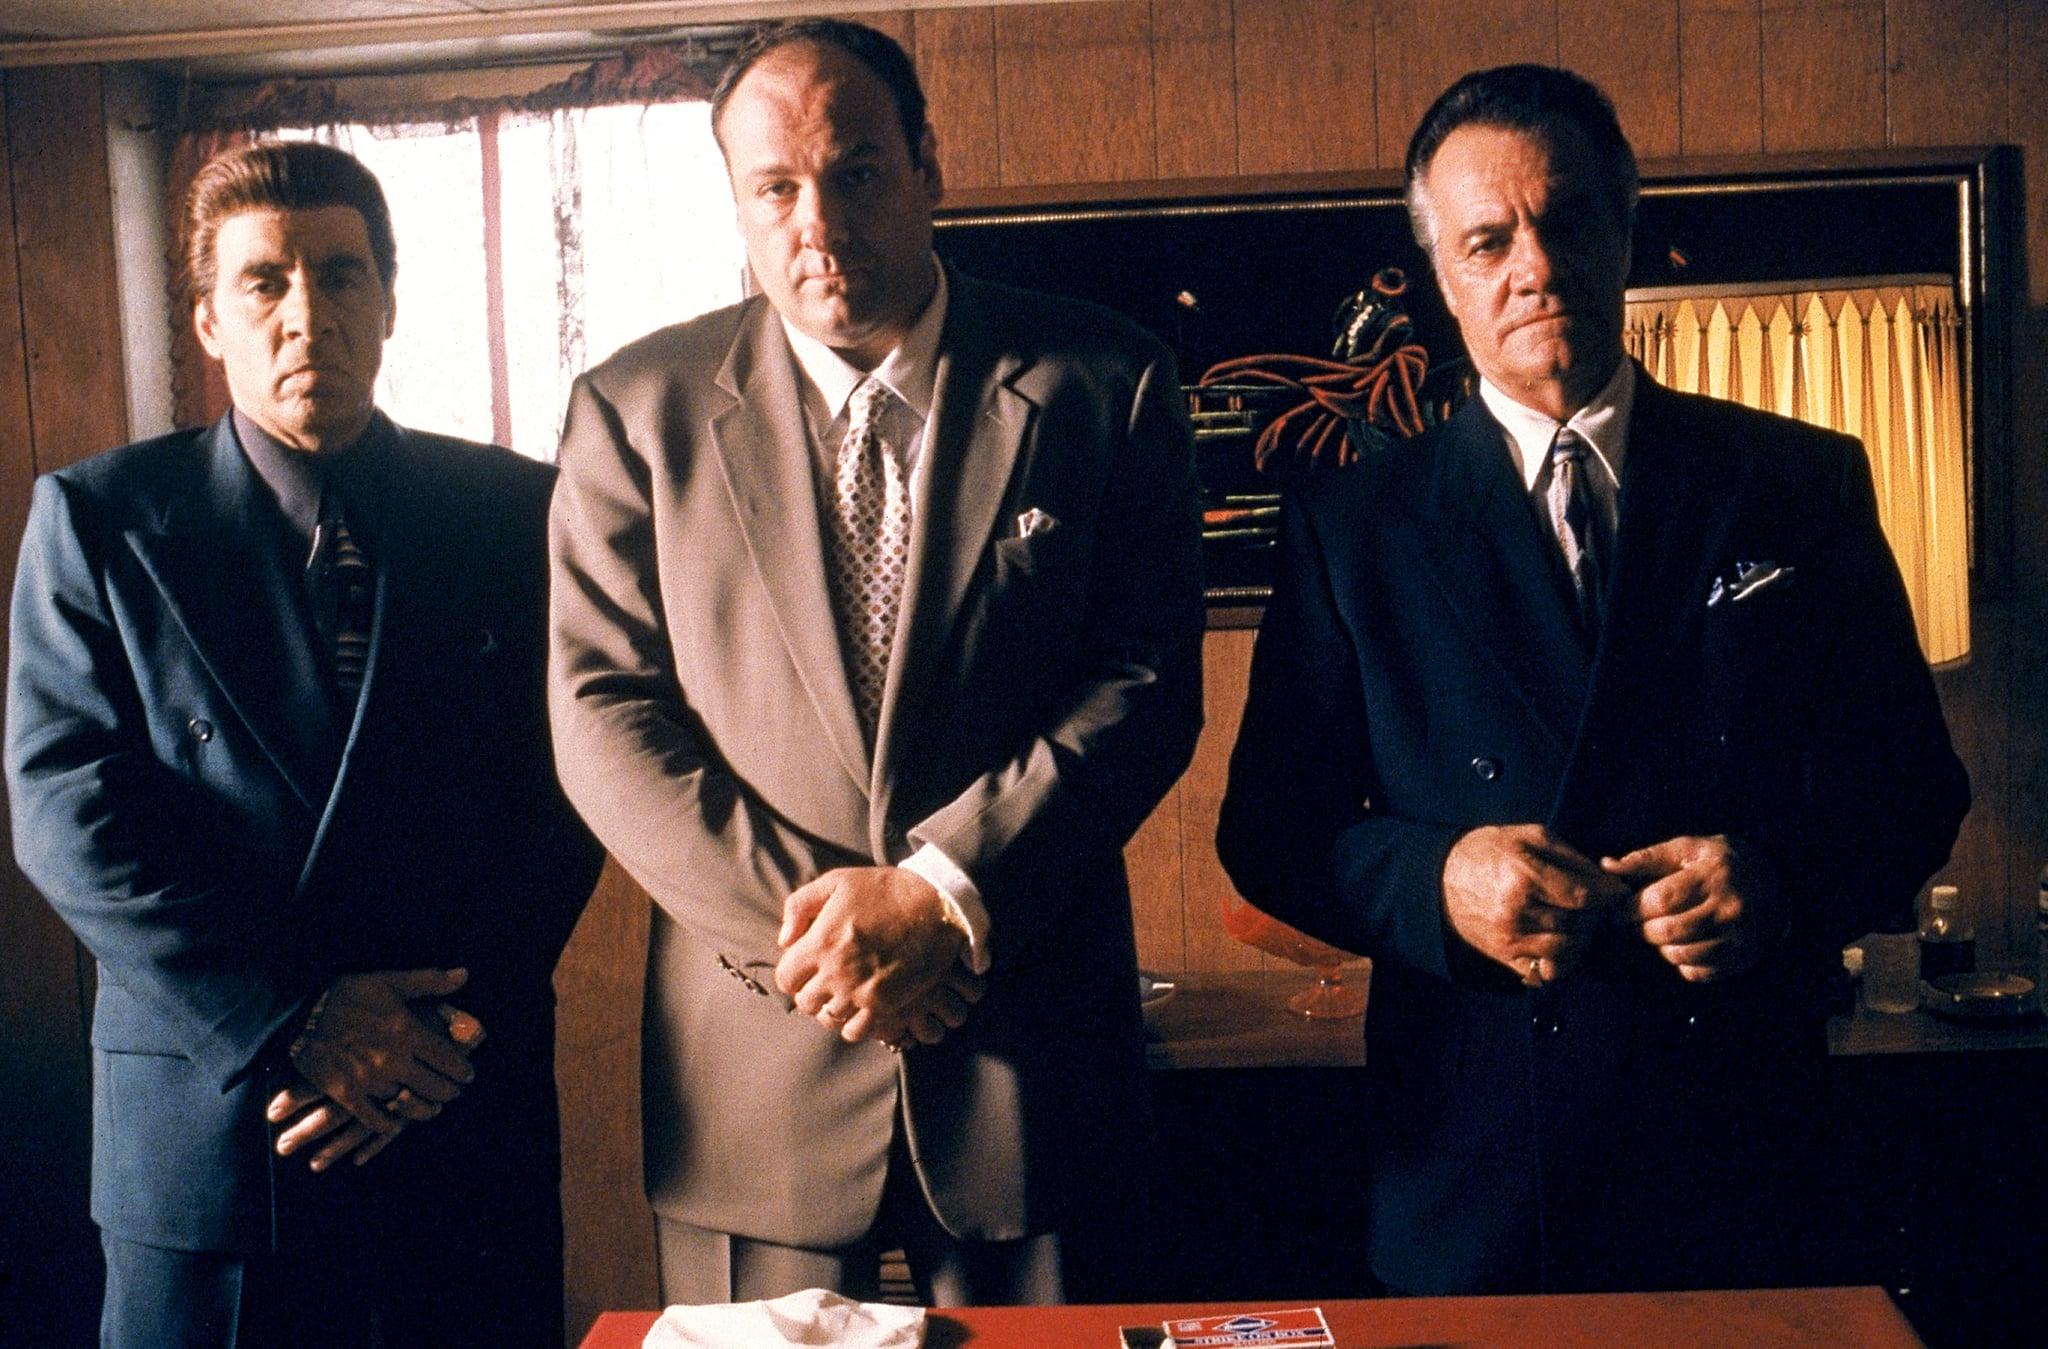 387931 01: From left to right: Steven Van Zandt as Silvio Dante, James Gandolfini as Tony Soprano and Tony Sirico as Paulie Walnuts star in HBO's hit television series,